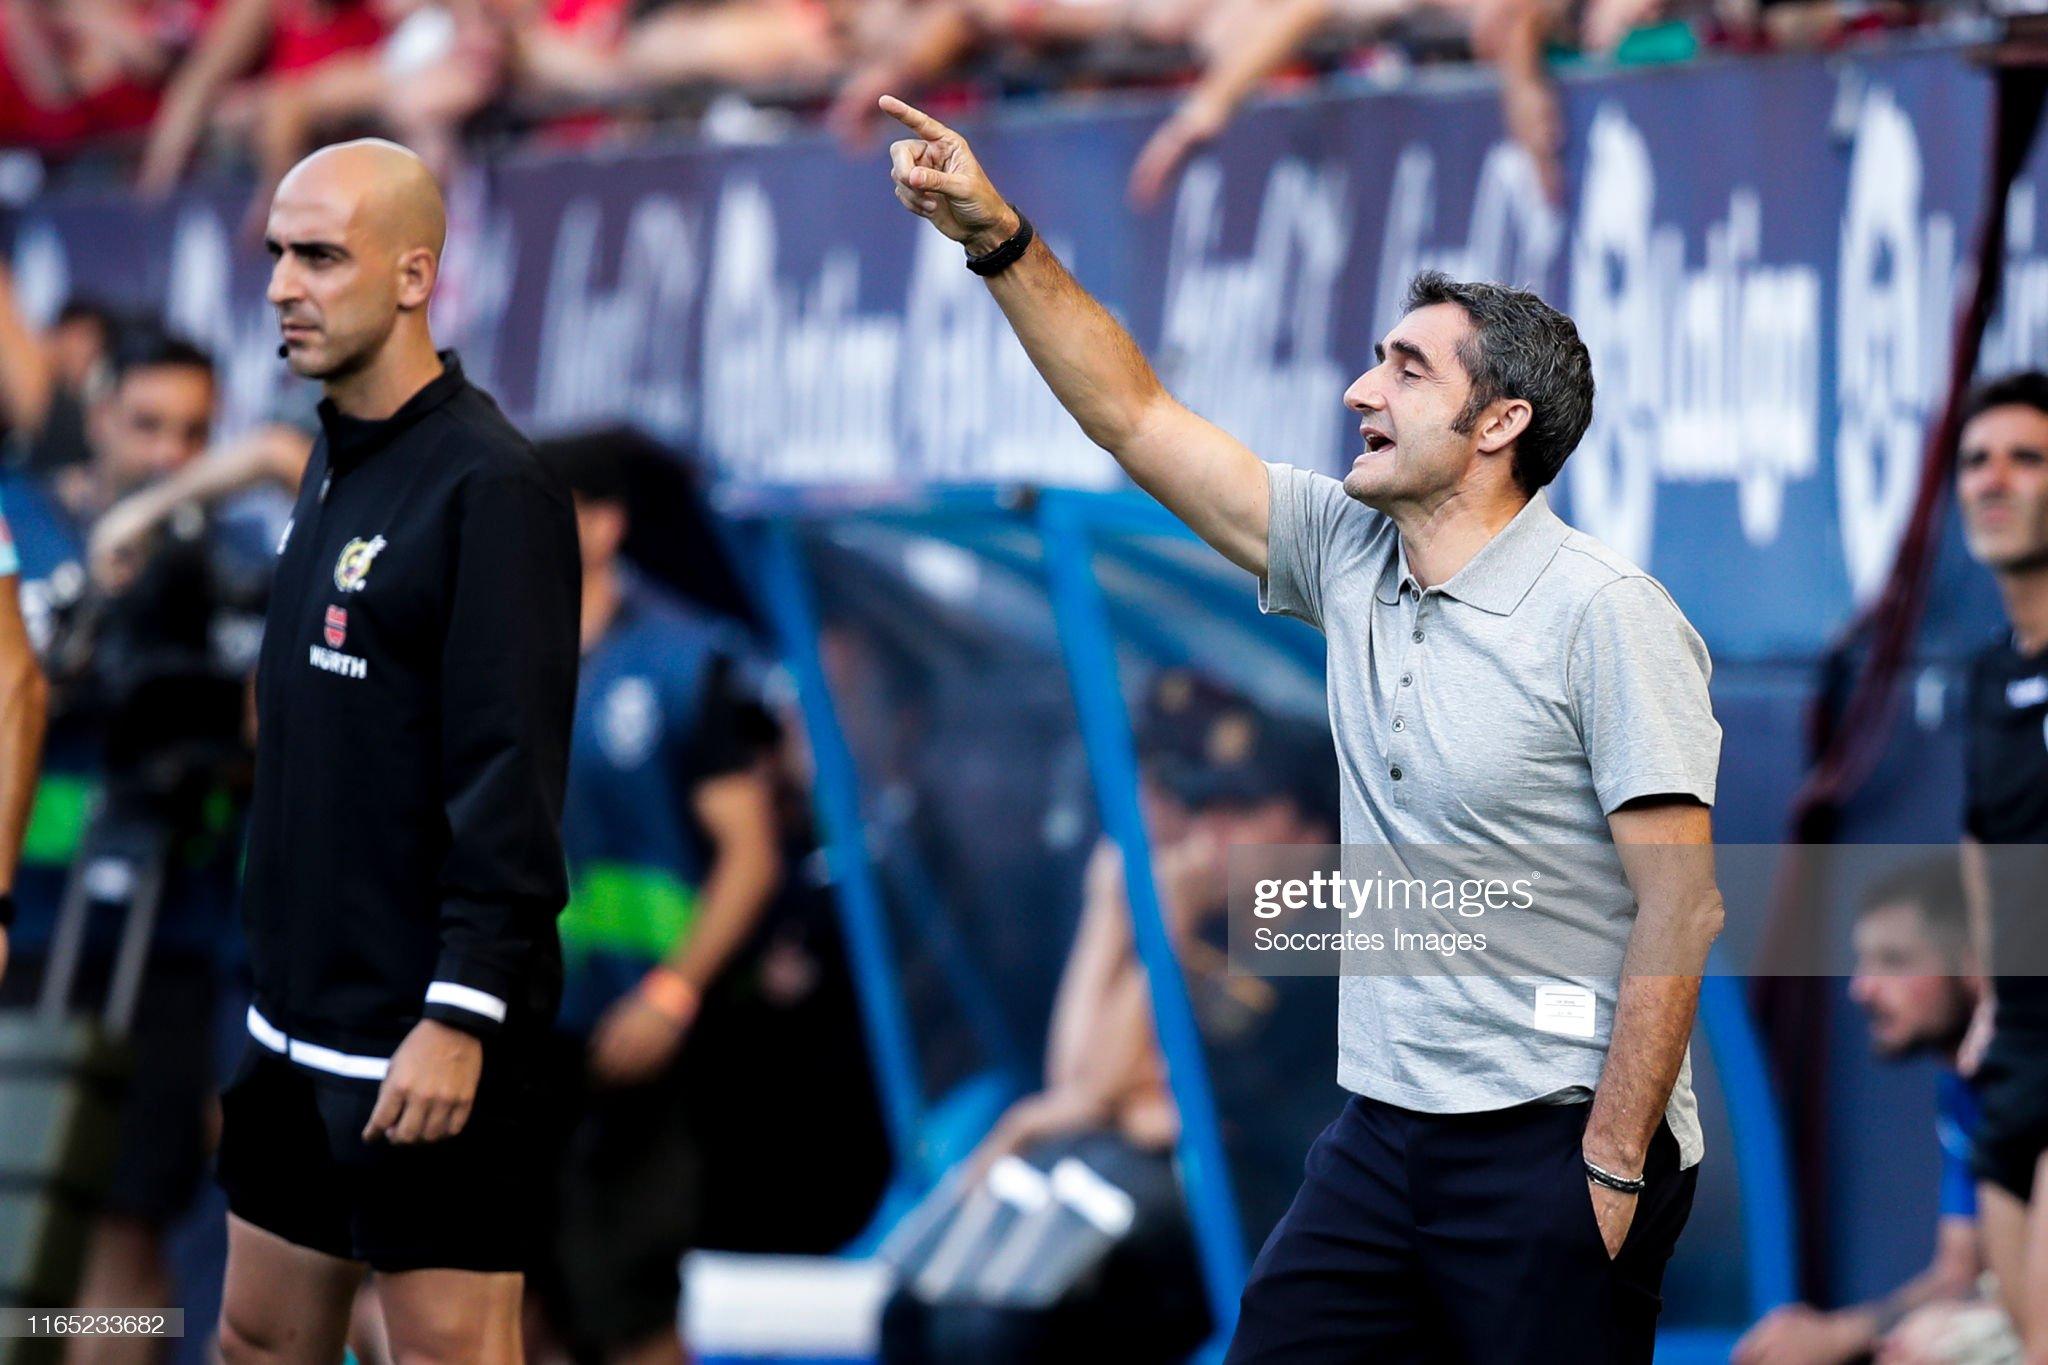 صور مباراة : أوساسونا - برشلونة 2-2 ( 31-08-2019 )  Coach-ernesto-valverde-of-fc-barcelona-during-the-la-liga-santander-picture-id1165233682?s=2048x2048